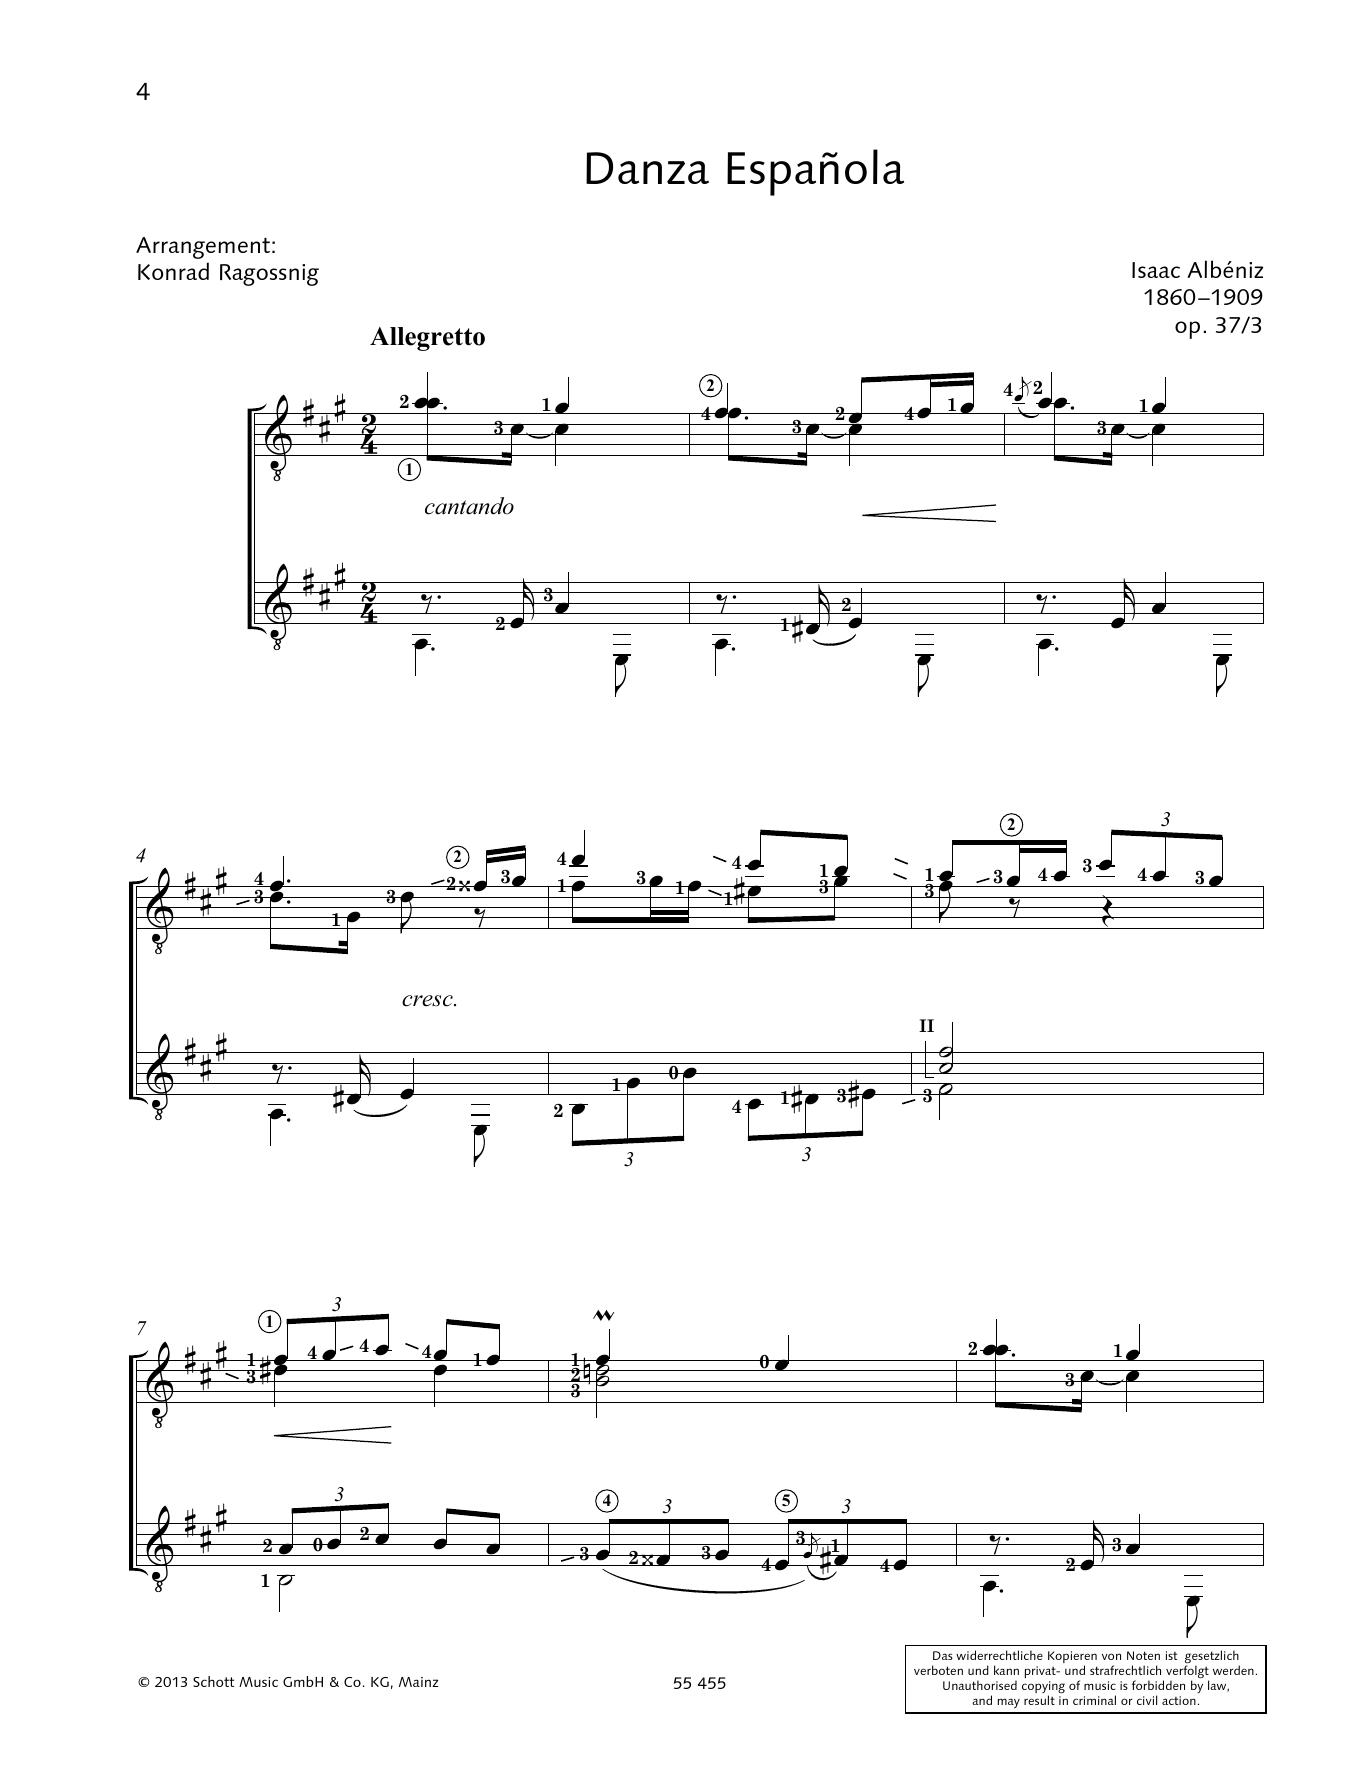 Danza Espanola - Full Score Sheet Music